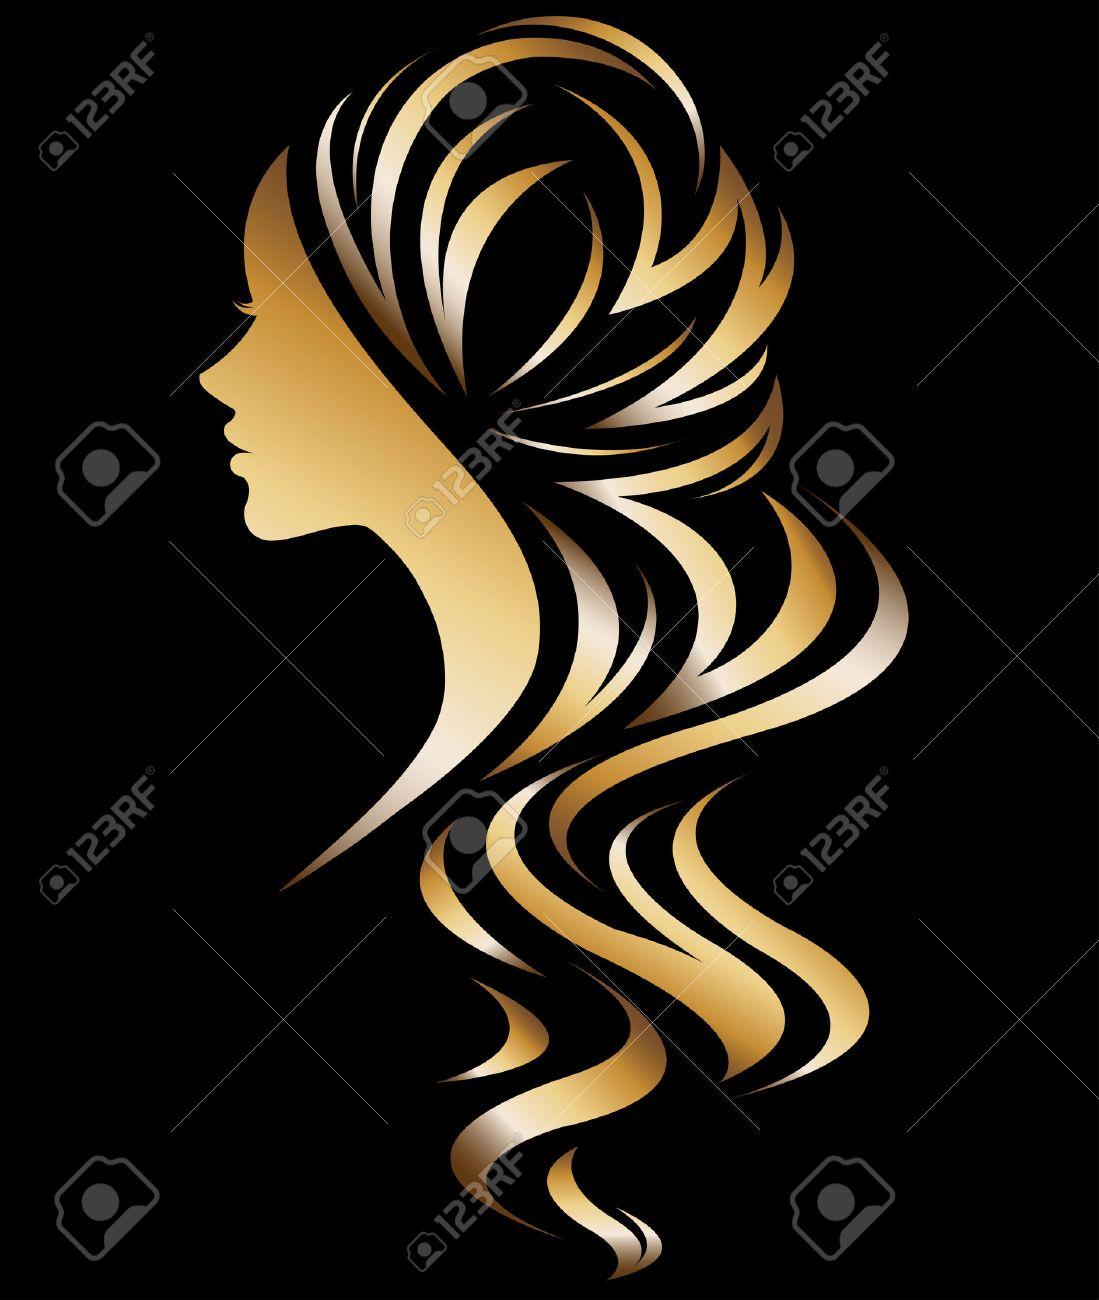 illustration vector of women silhouette golden icon, women face logo on black background - 69149707